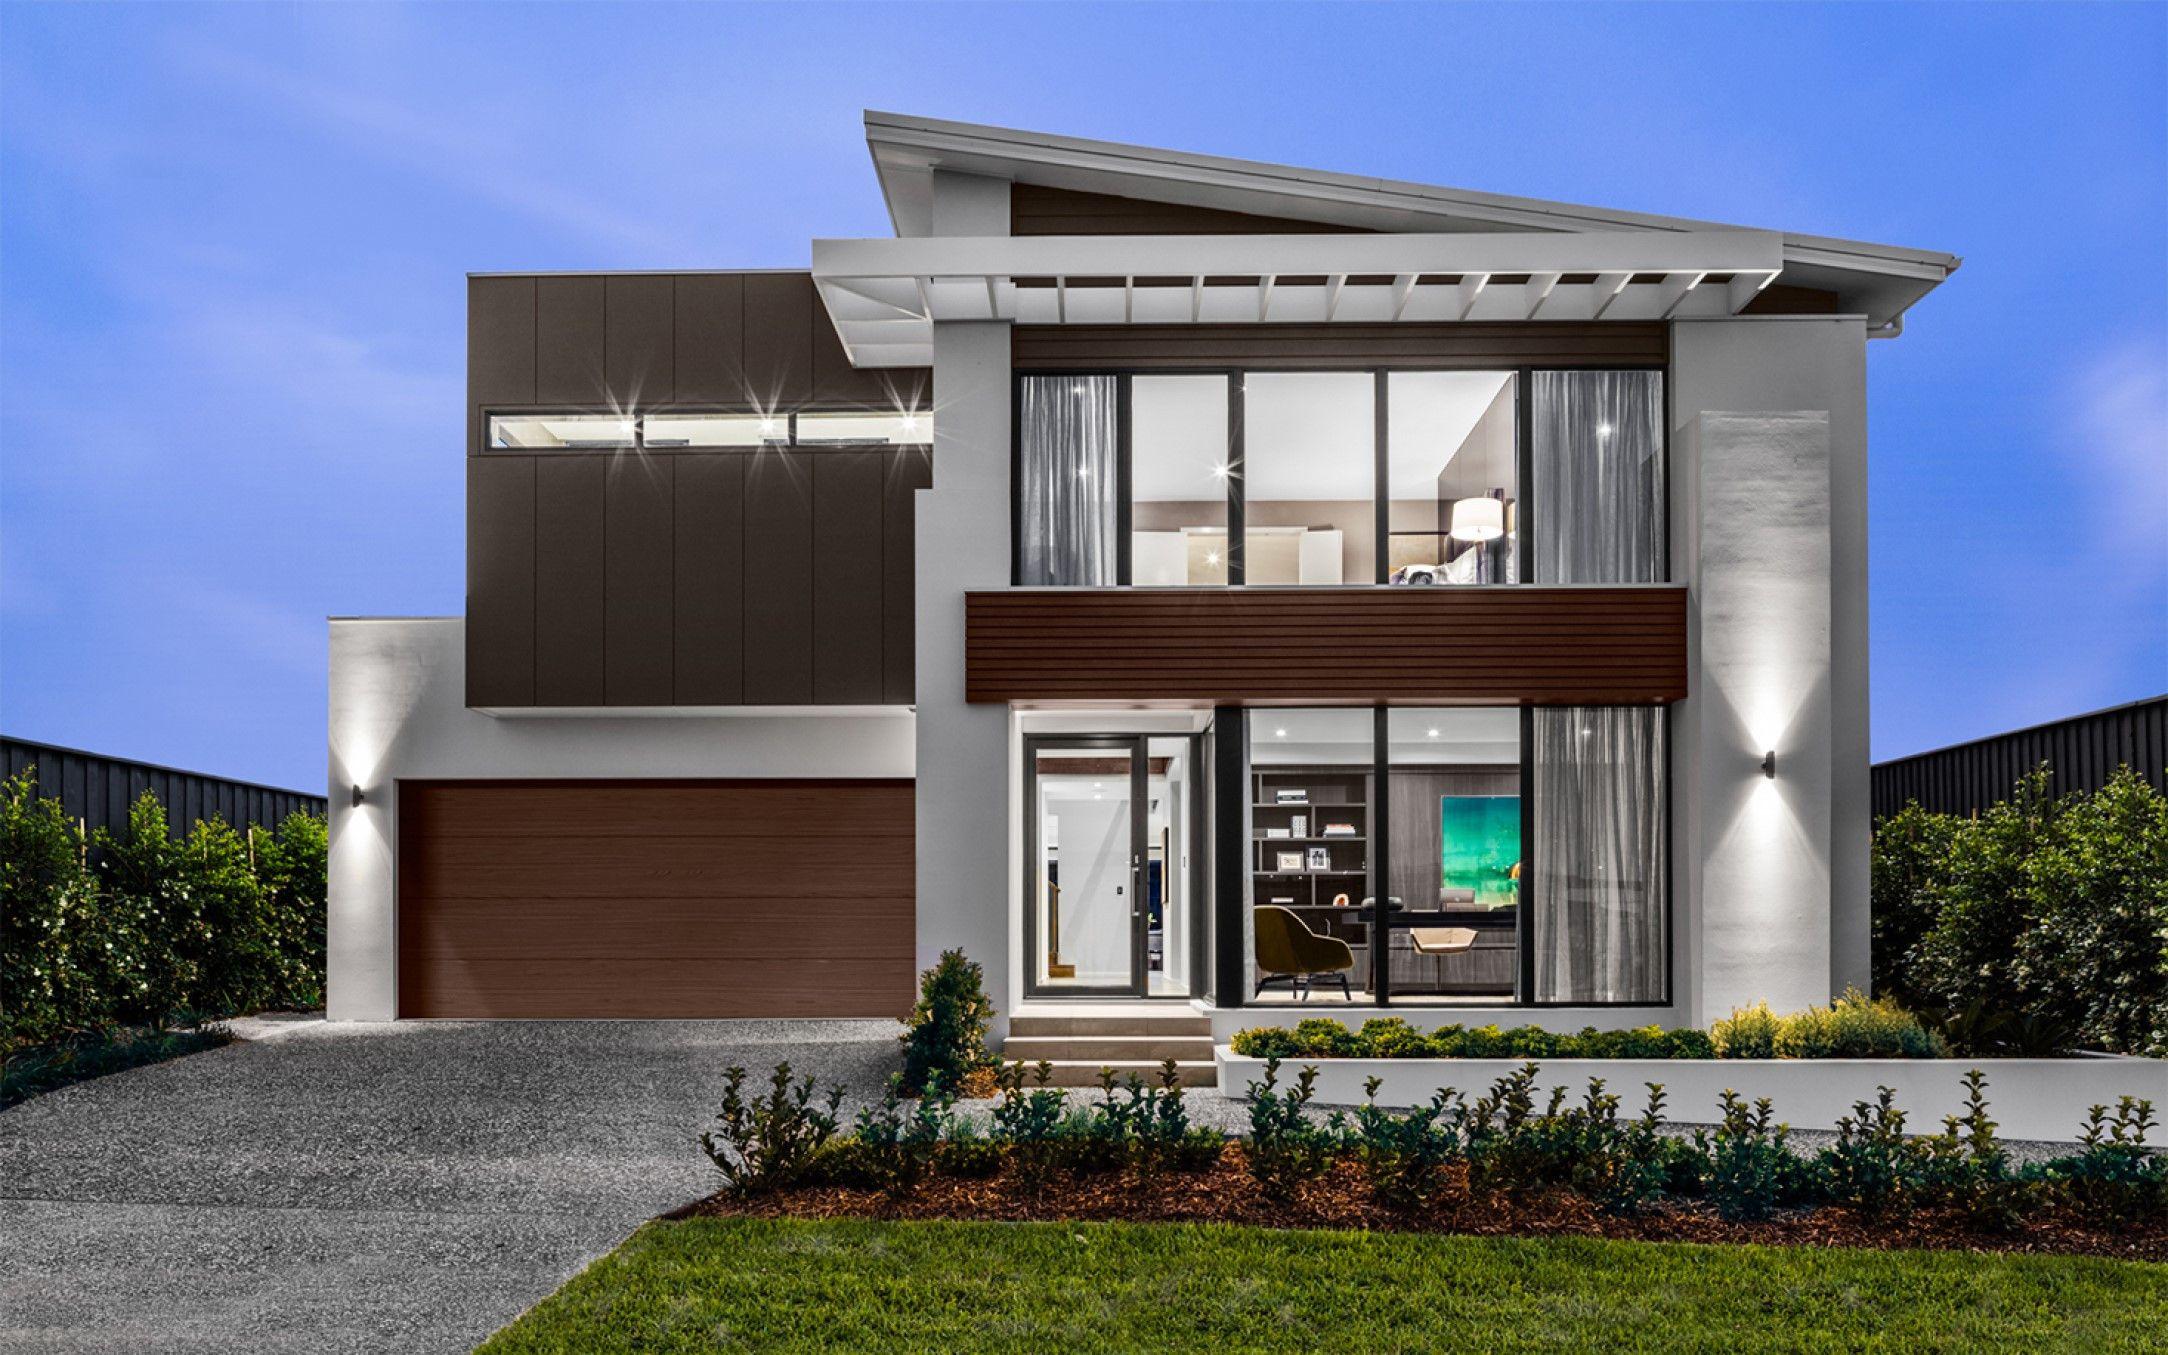 fasad rumah minimalis yang hidup